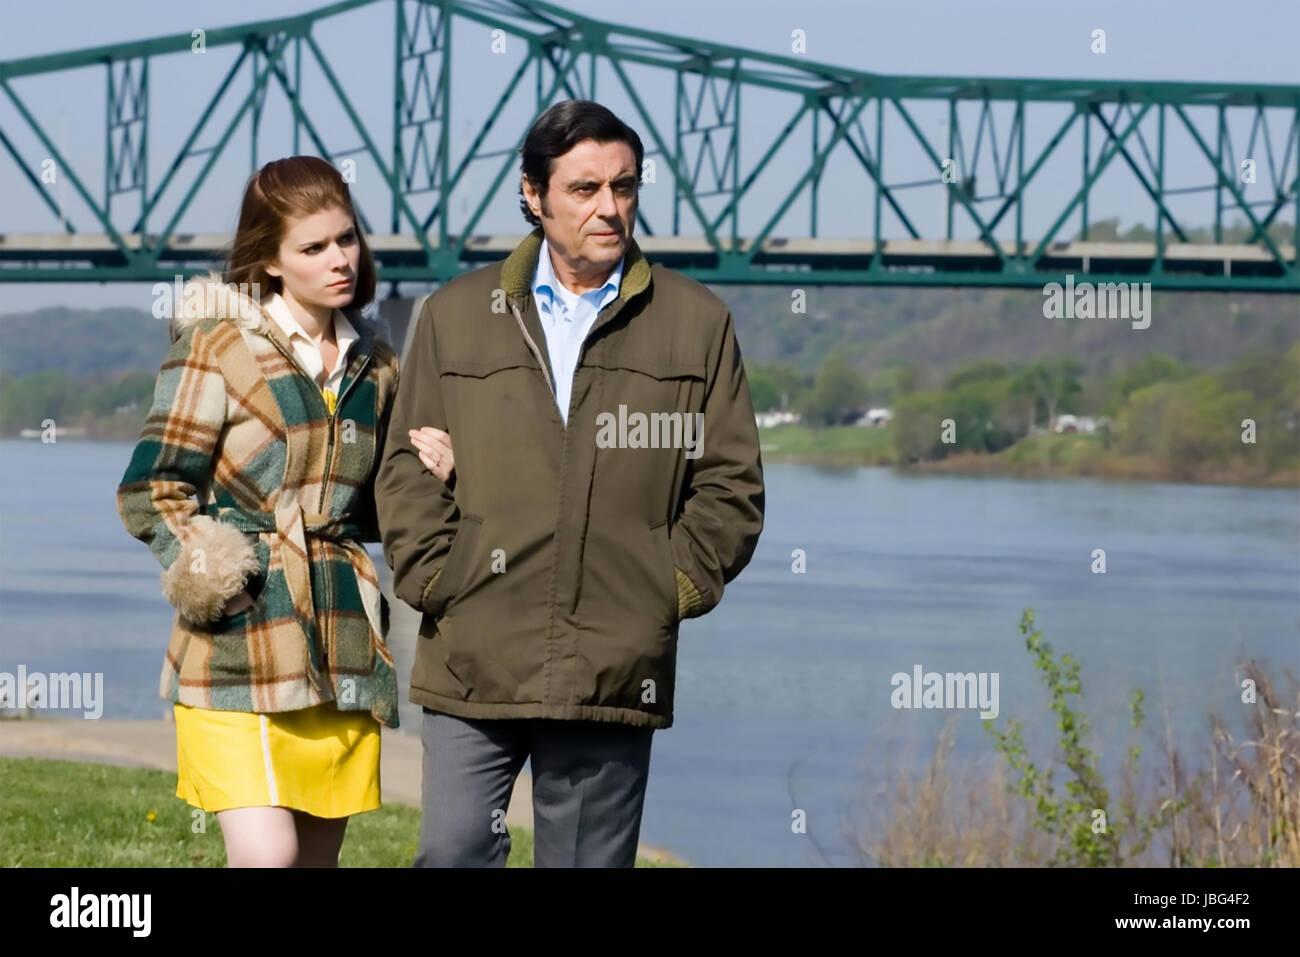 WE ARE MARSHALL 2006 Warner Bros film with Kate Mara and Ian McShane - Stock Image